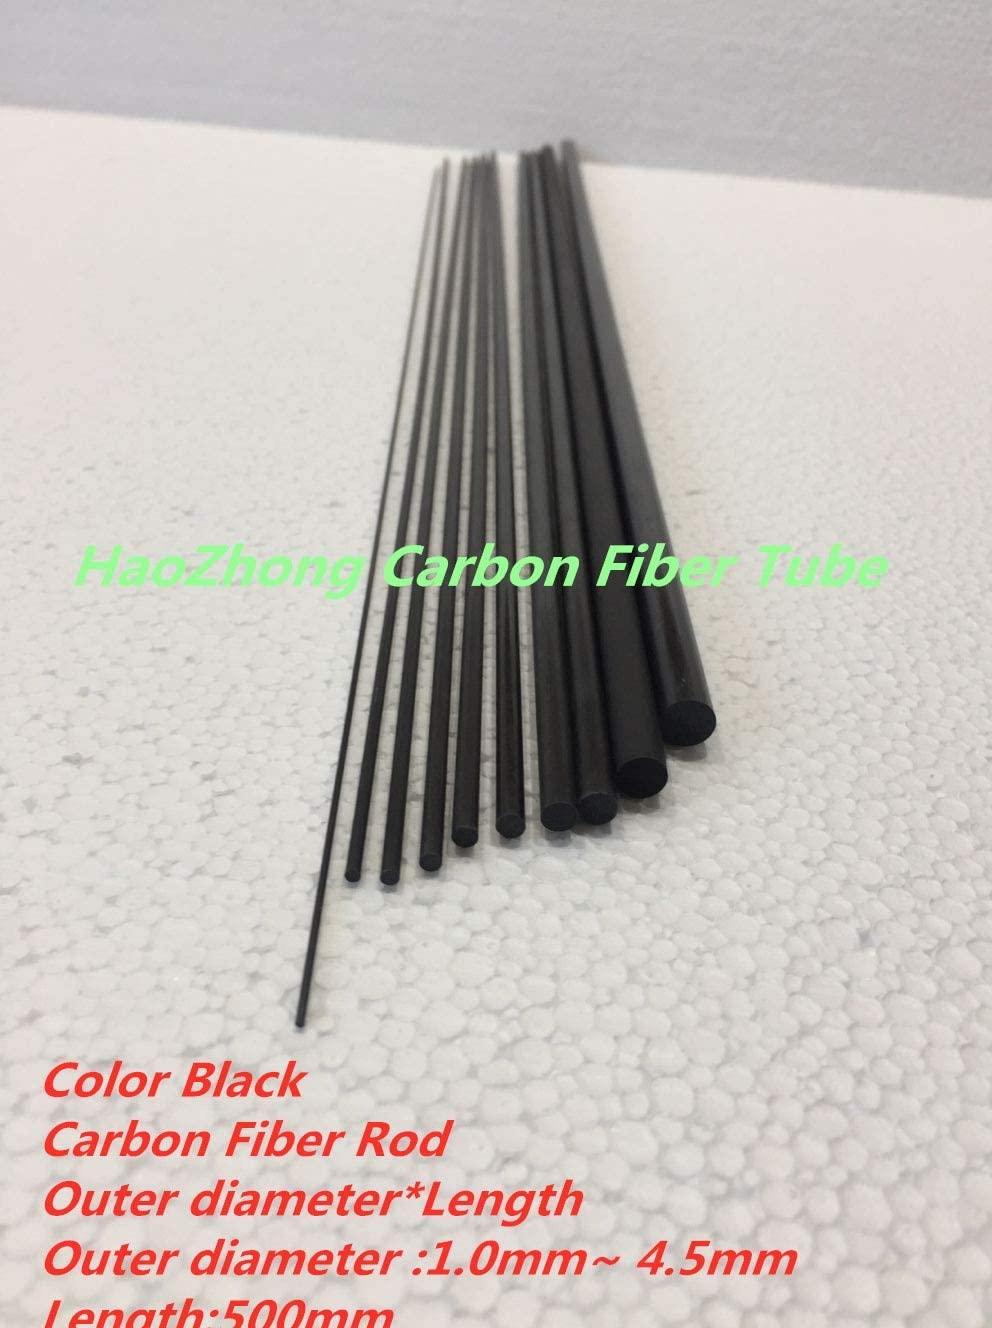 Parts & Accessories Carbon Fiber Rods od 1.0mm 2.0mm 2.5mm 3.0mm 3.5mm 4.0mm 4.5mmm Black Length 500mm Suit for RC Model - (Color: 10pcs od 3.0mm)